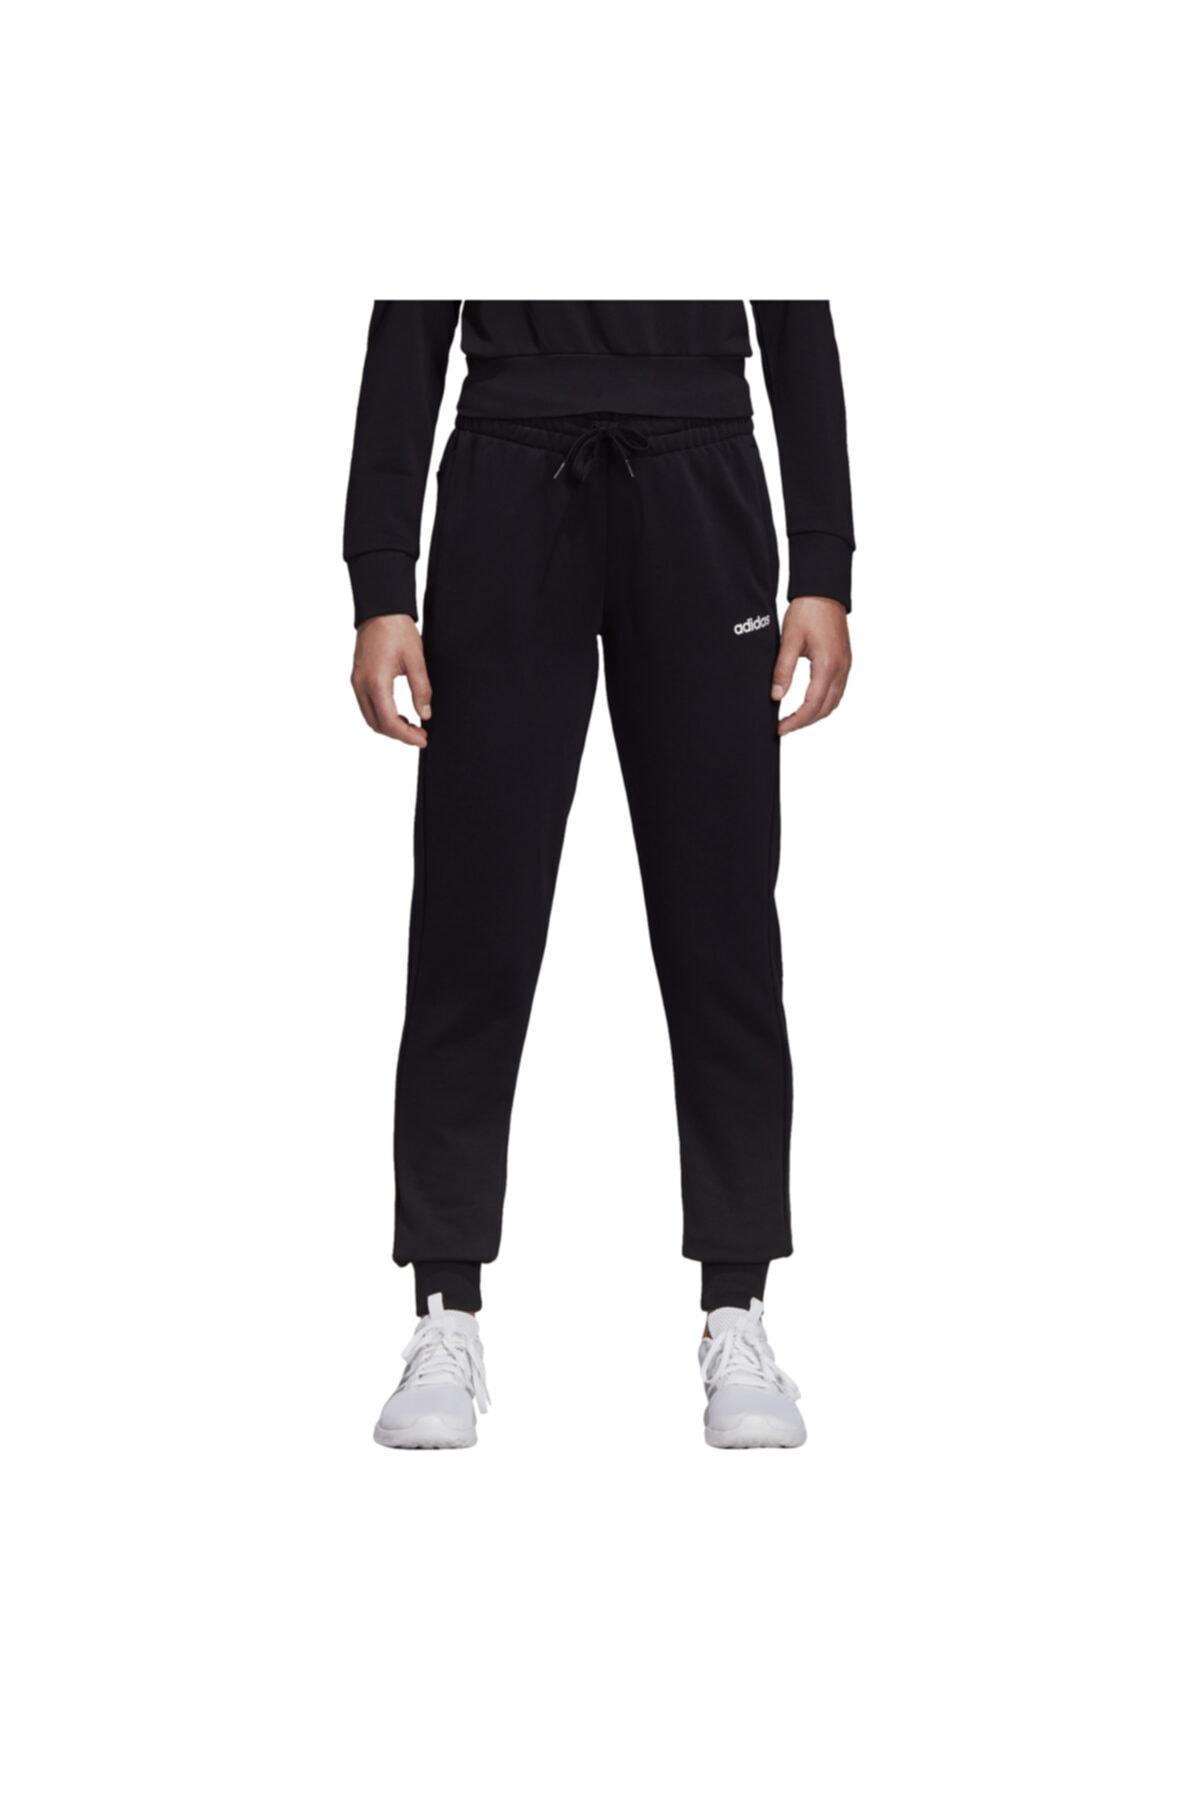 adidas W E PLN PANT Siyah Kadın Eşofman 100664227 1